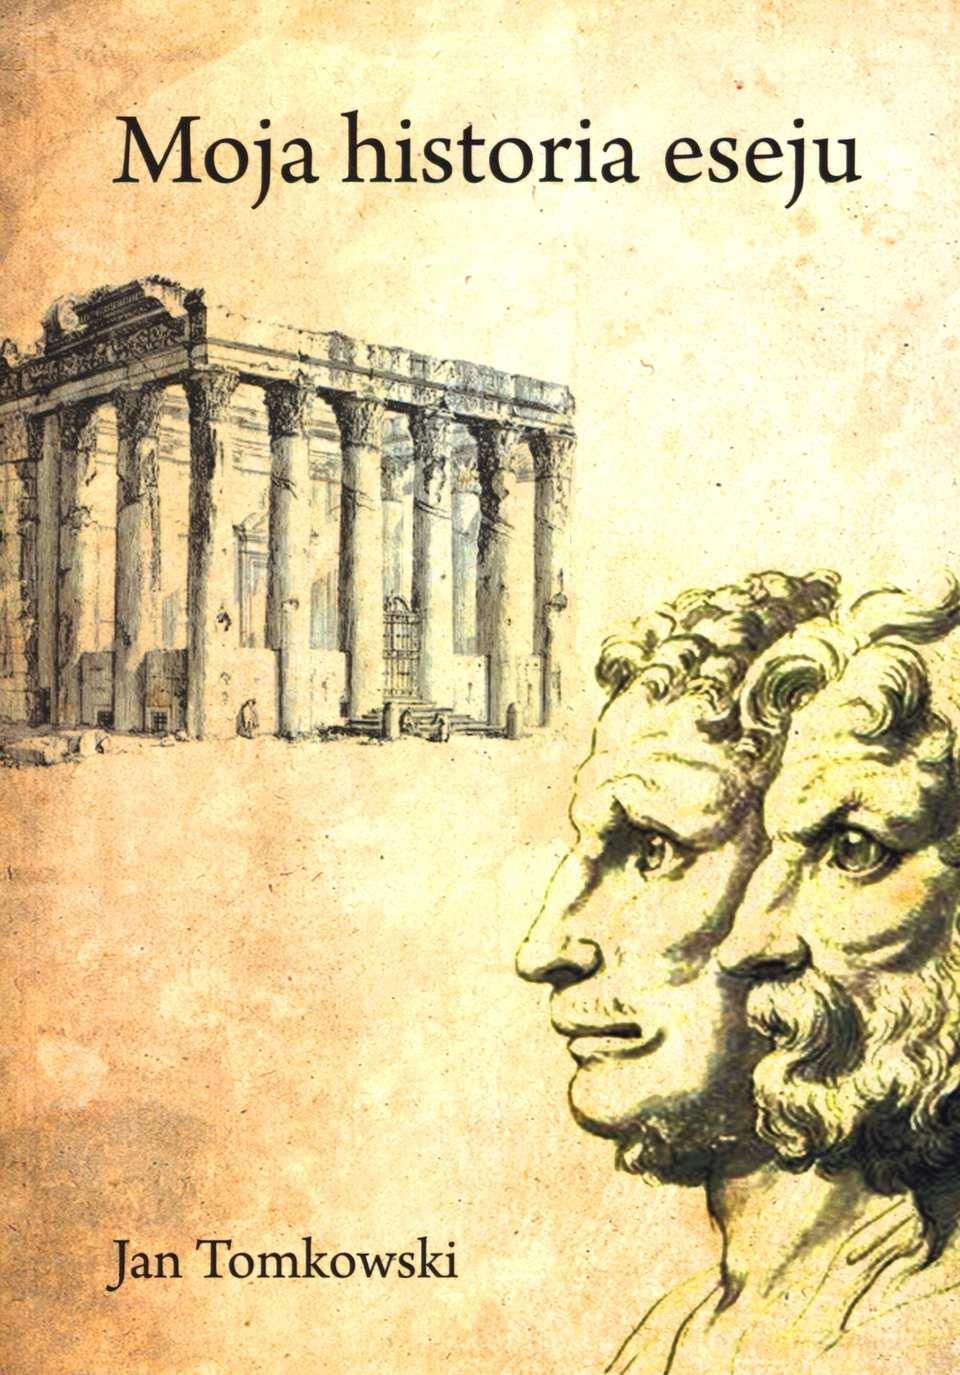 Moja Historia Eseju - Ebook (Książka PDF) do pobrania w formacie PDF